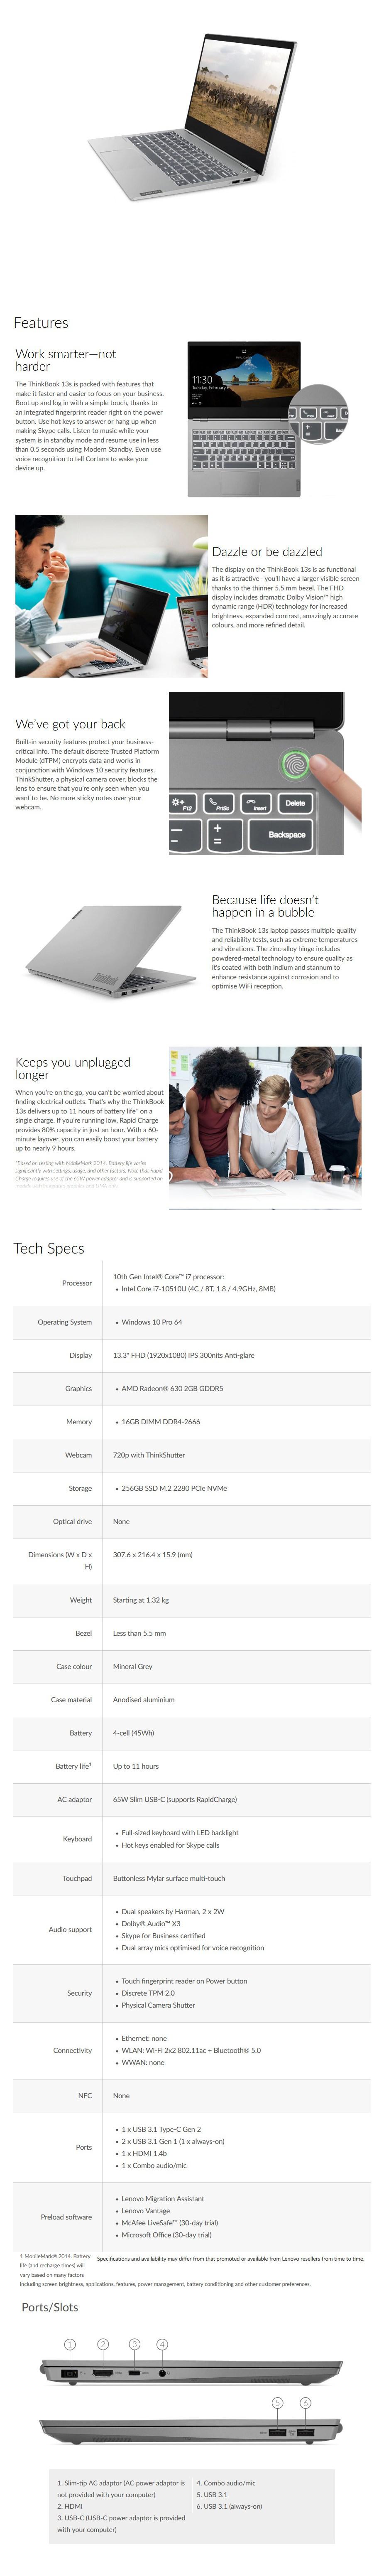 "Lenovo ThinkBook 13s 13.3"" Laptop i7-10510U 16GB 256GB SSD Radeon 630 W10P - Overview 1"